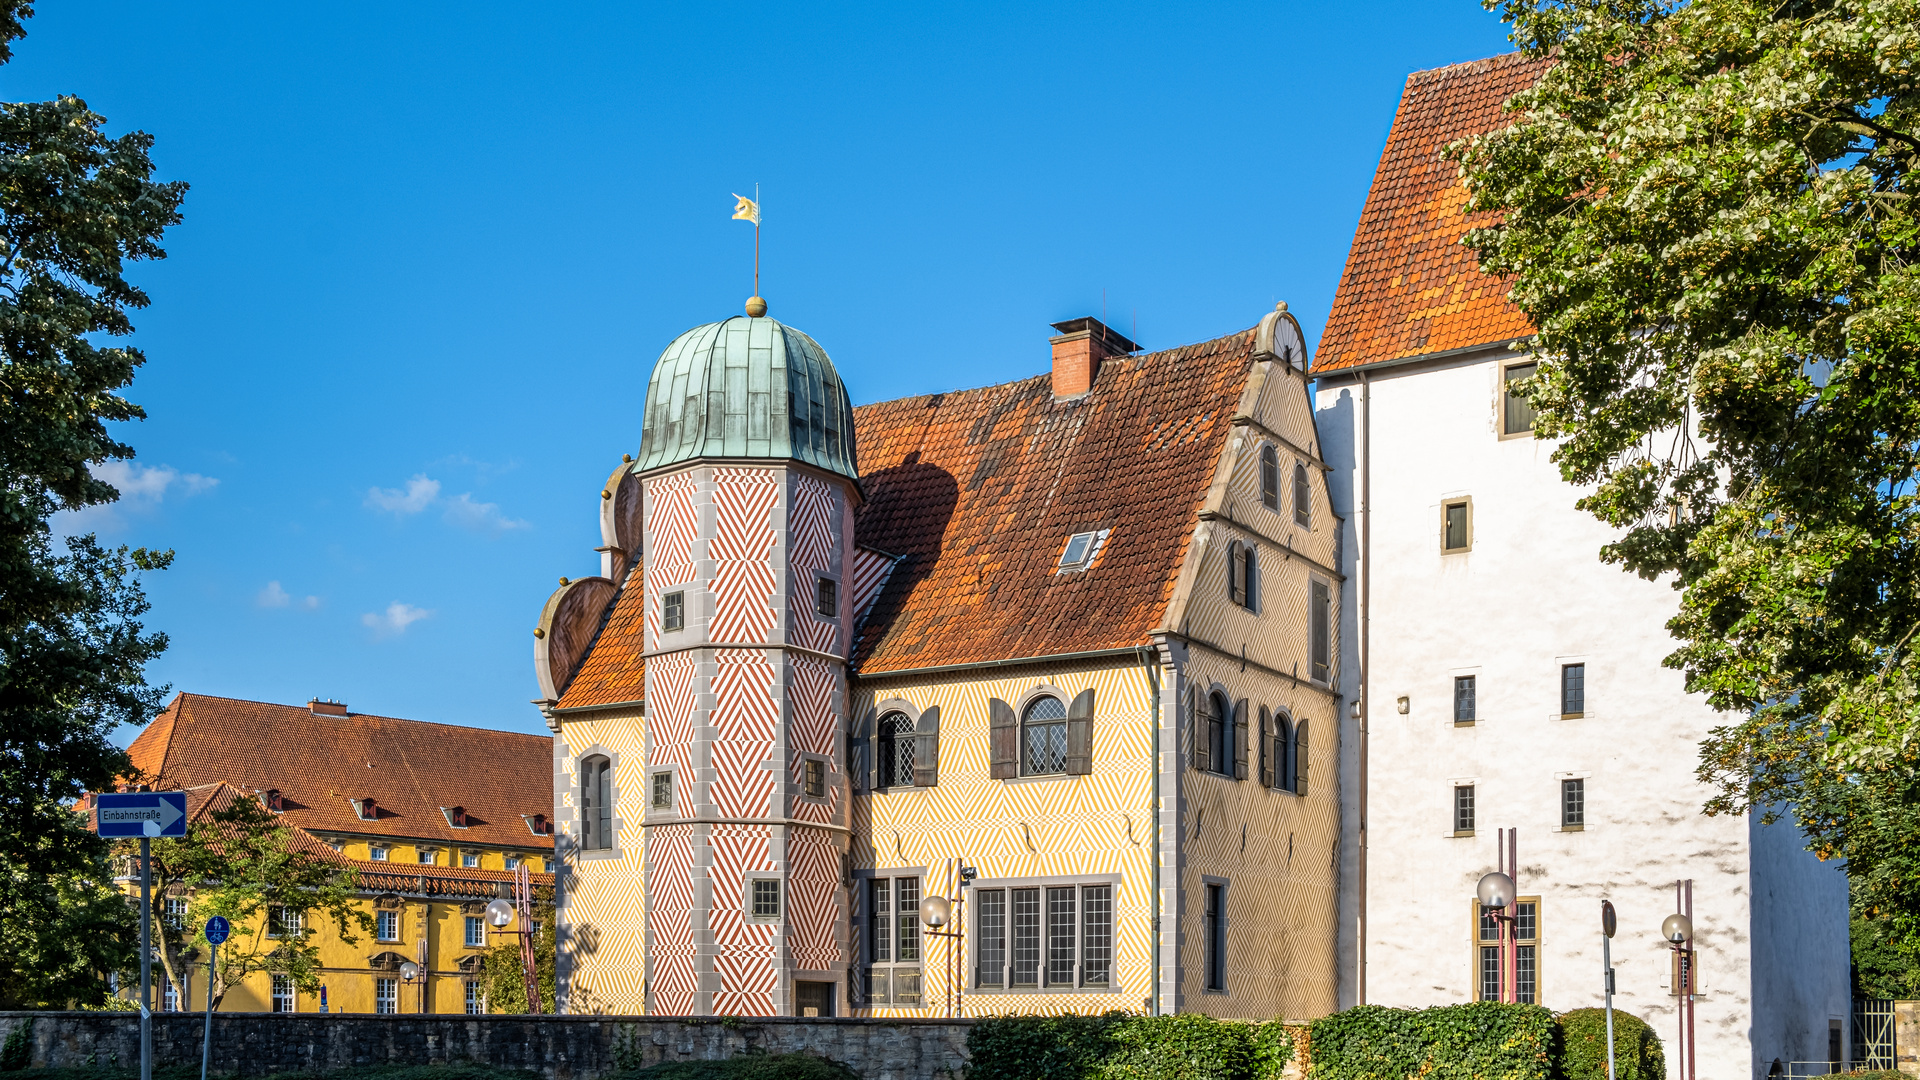 Ledenhof oder Alte Münze, Osnabrück